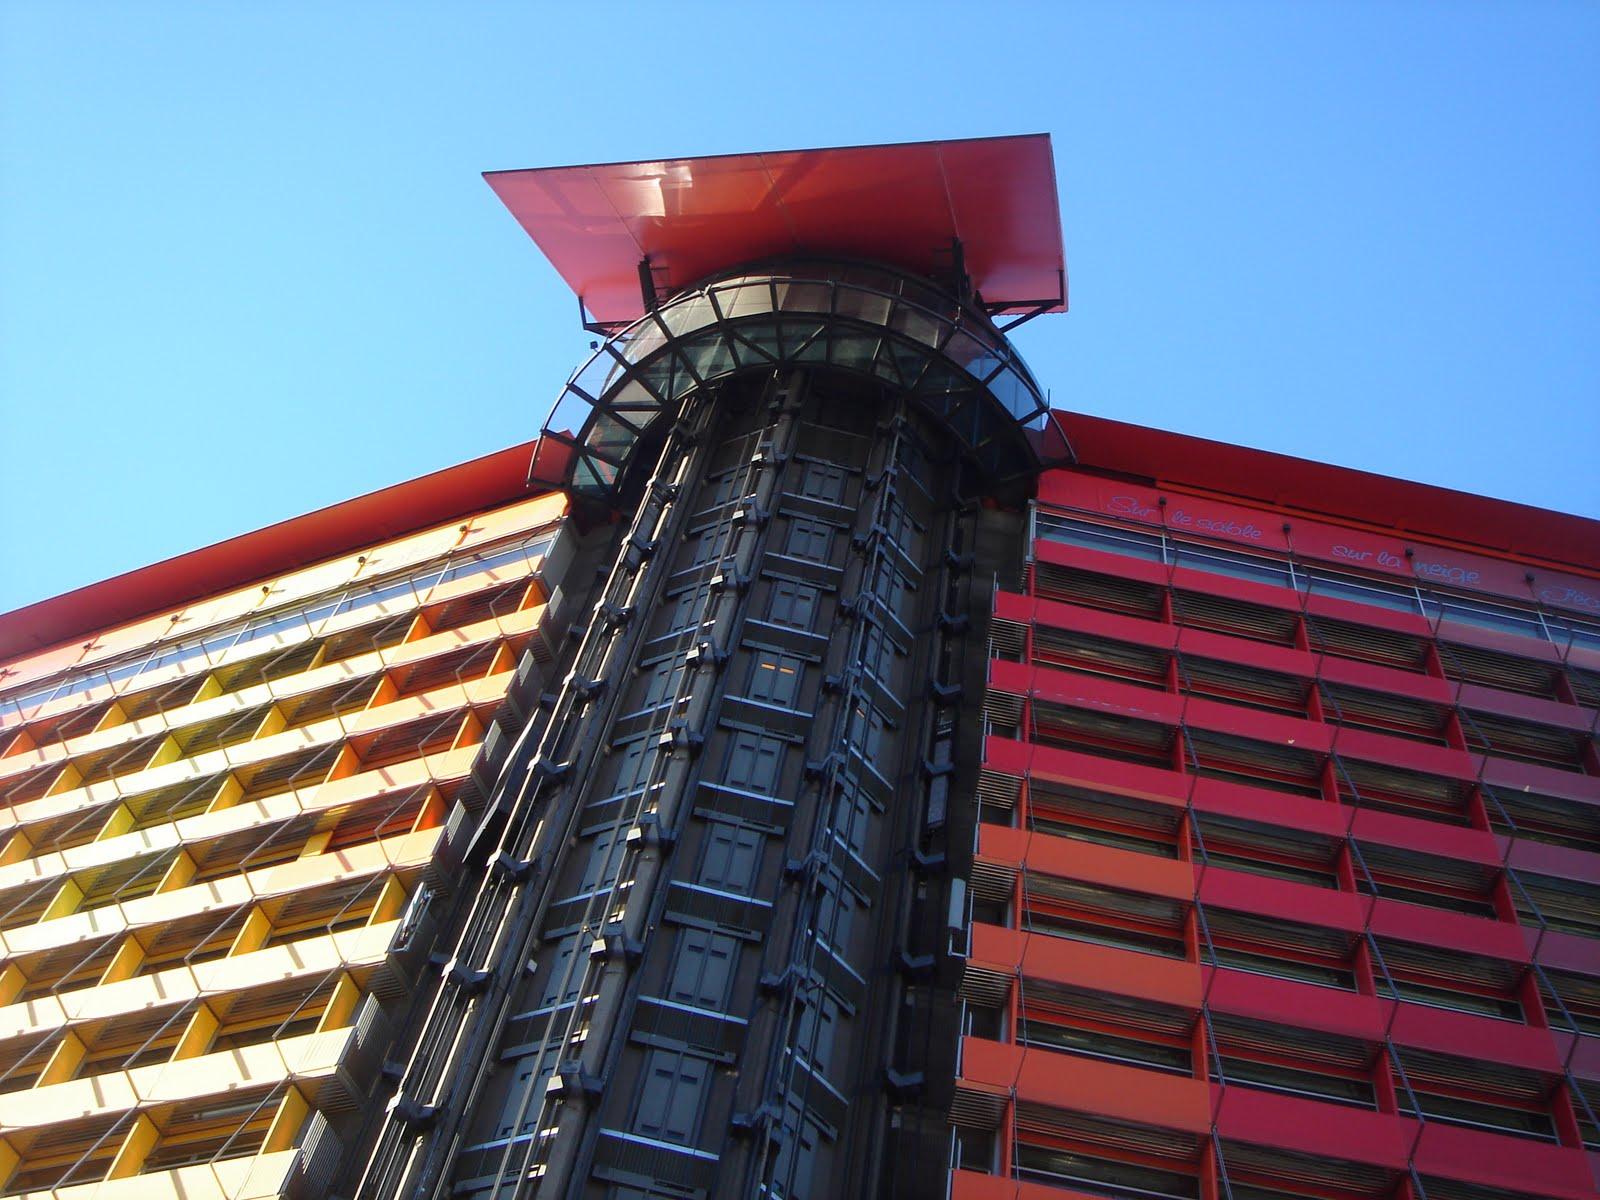 Historia y genealog a hotel puerta de am rica madrid - Hotel mariscal madrid ...